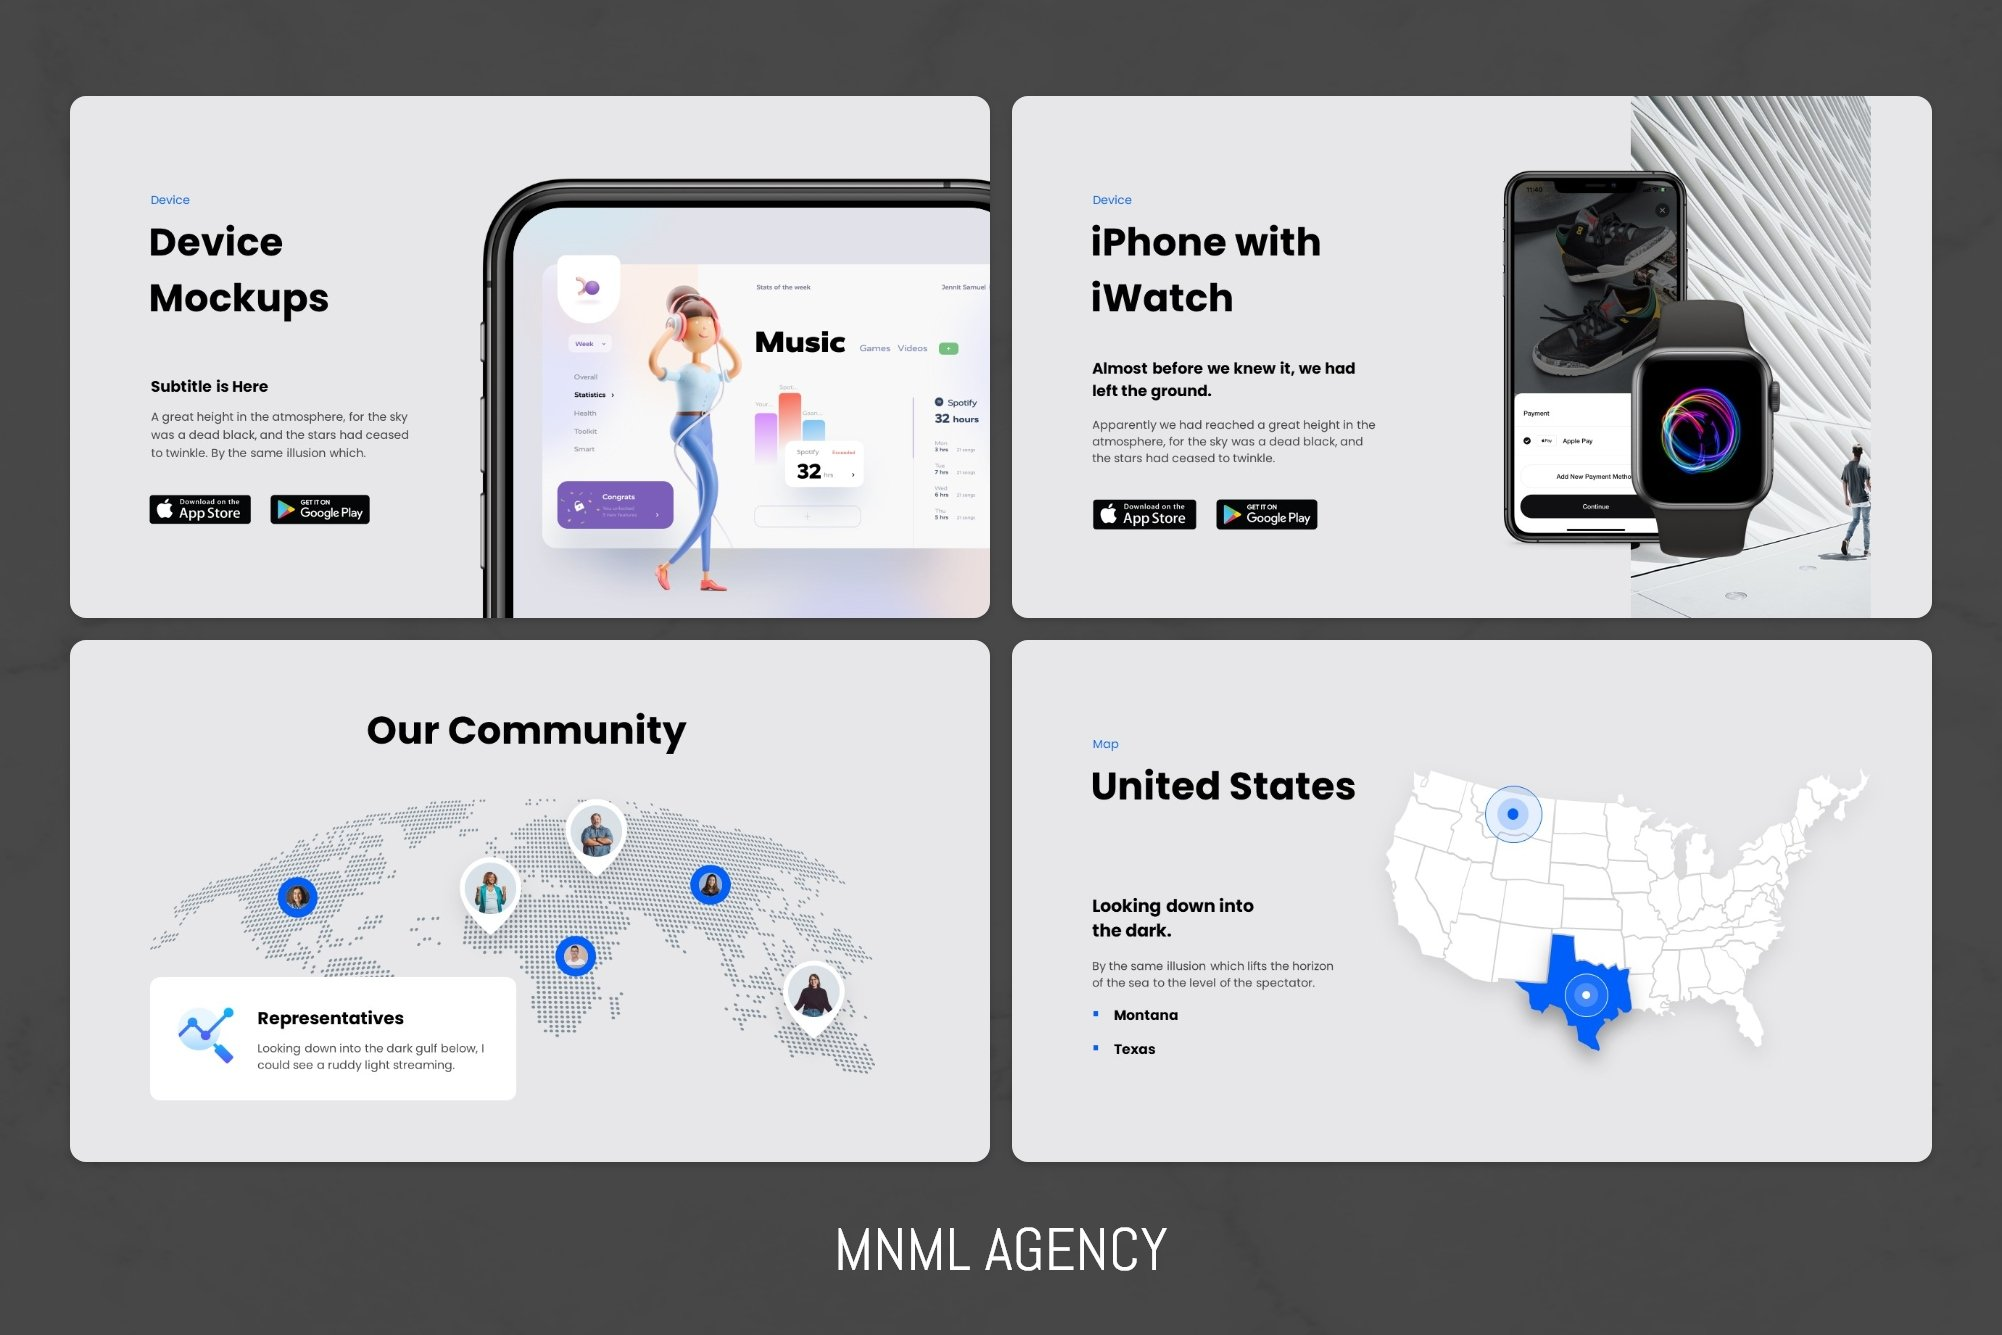 This slide shows design flexibility and responsiveness.